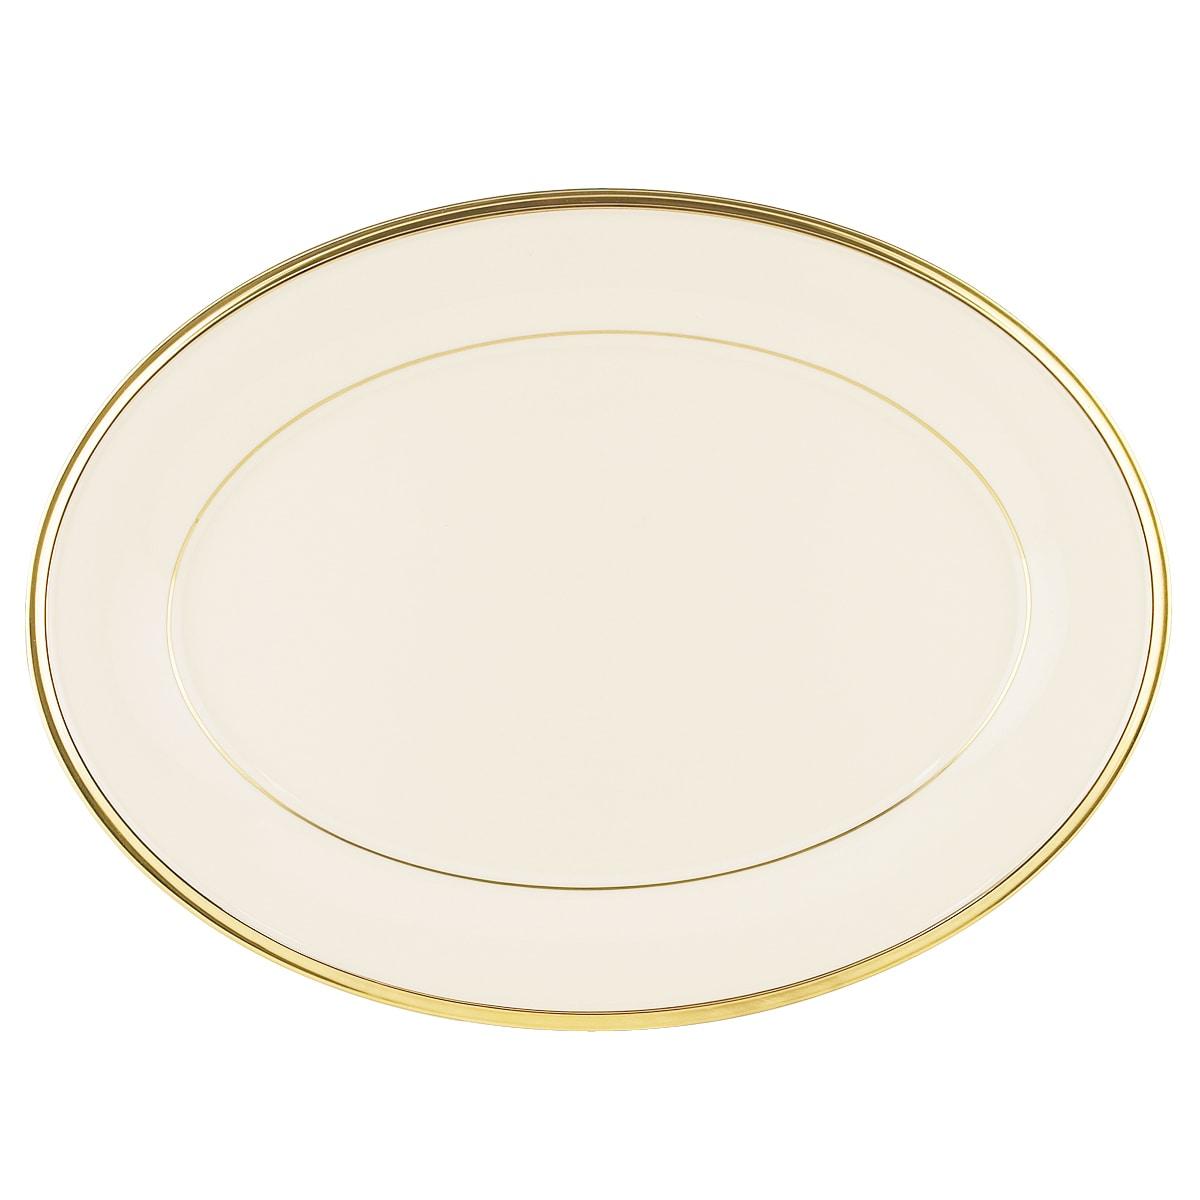 Lenox Eternal' 13-inch Oval Platter, Ivory (Plastic, Banded)